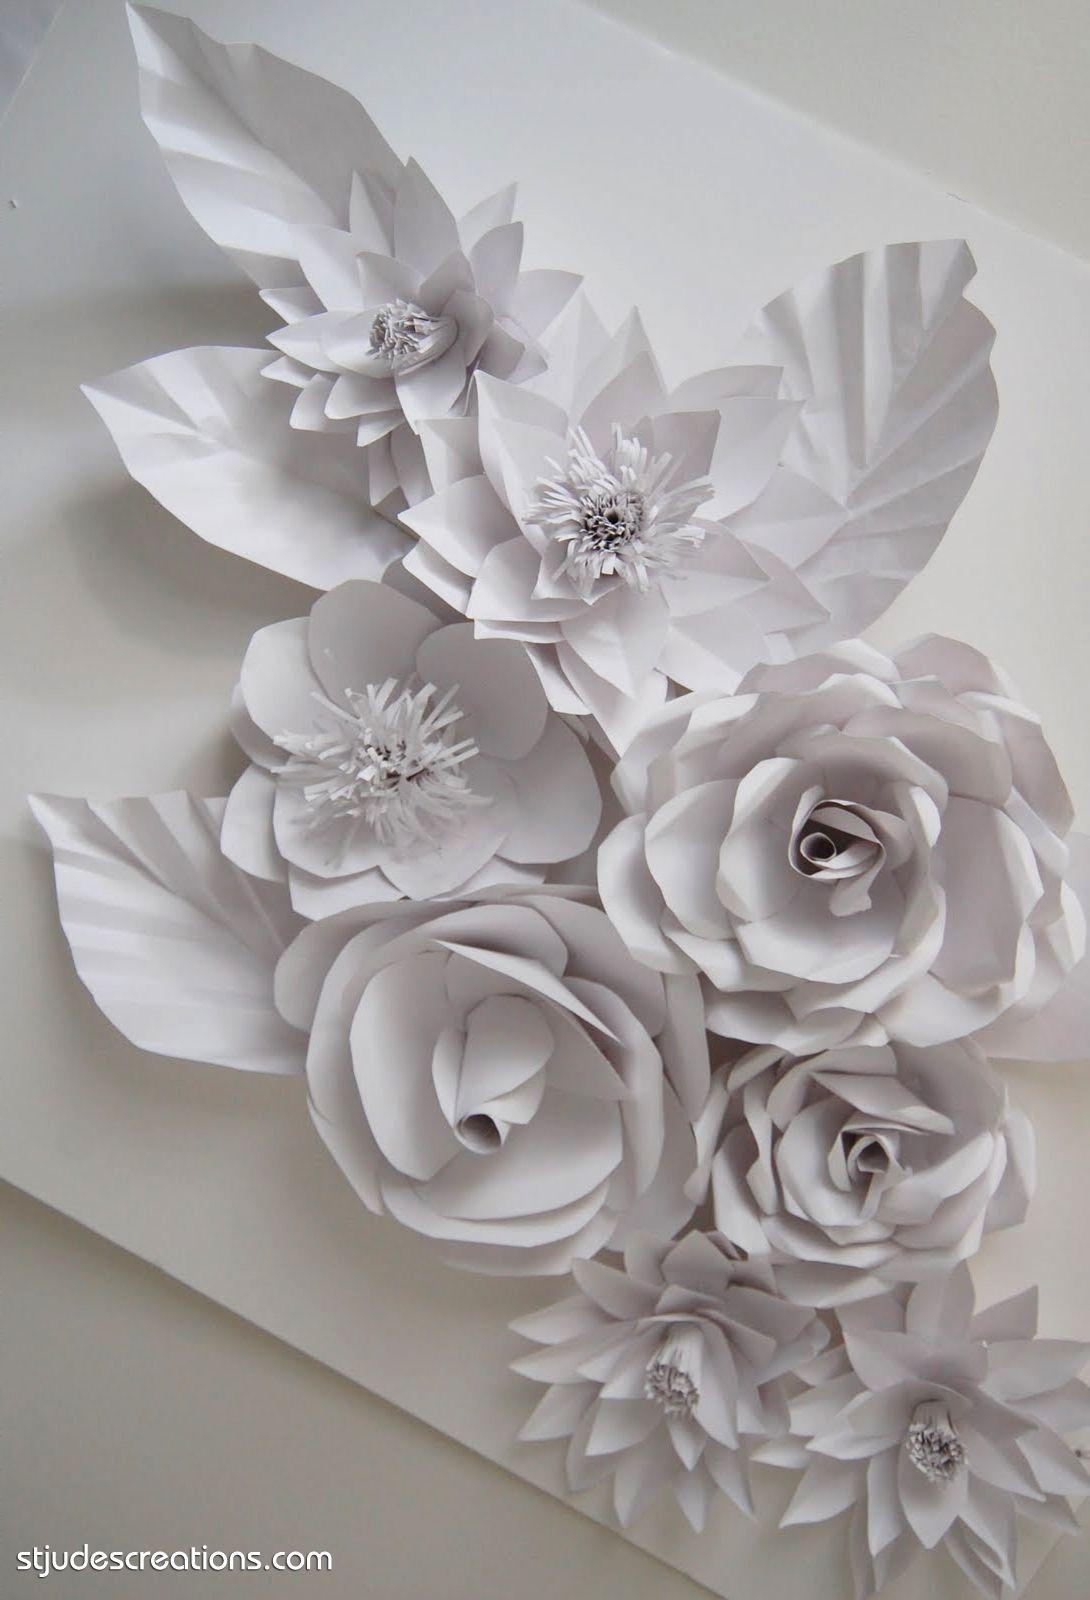 St Judes Creations Paper Flowers Gray Pinterest Paper